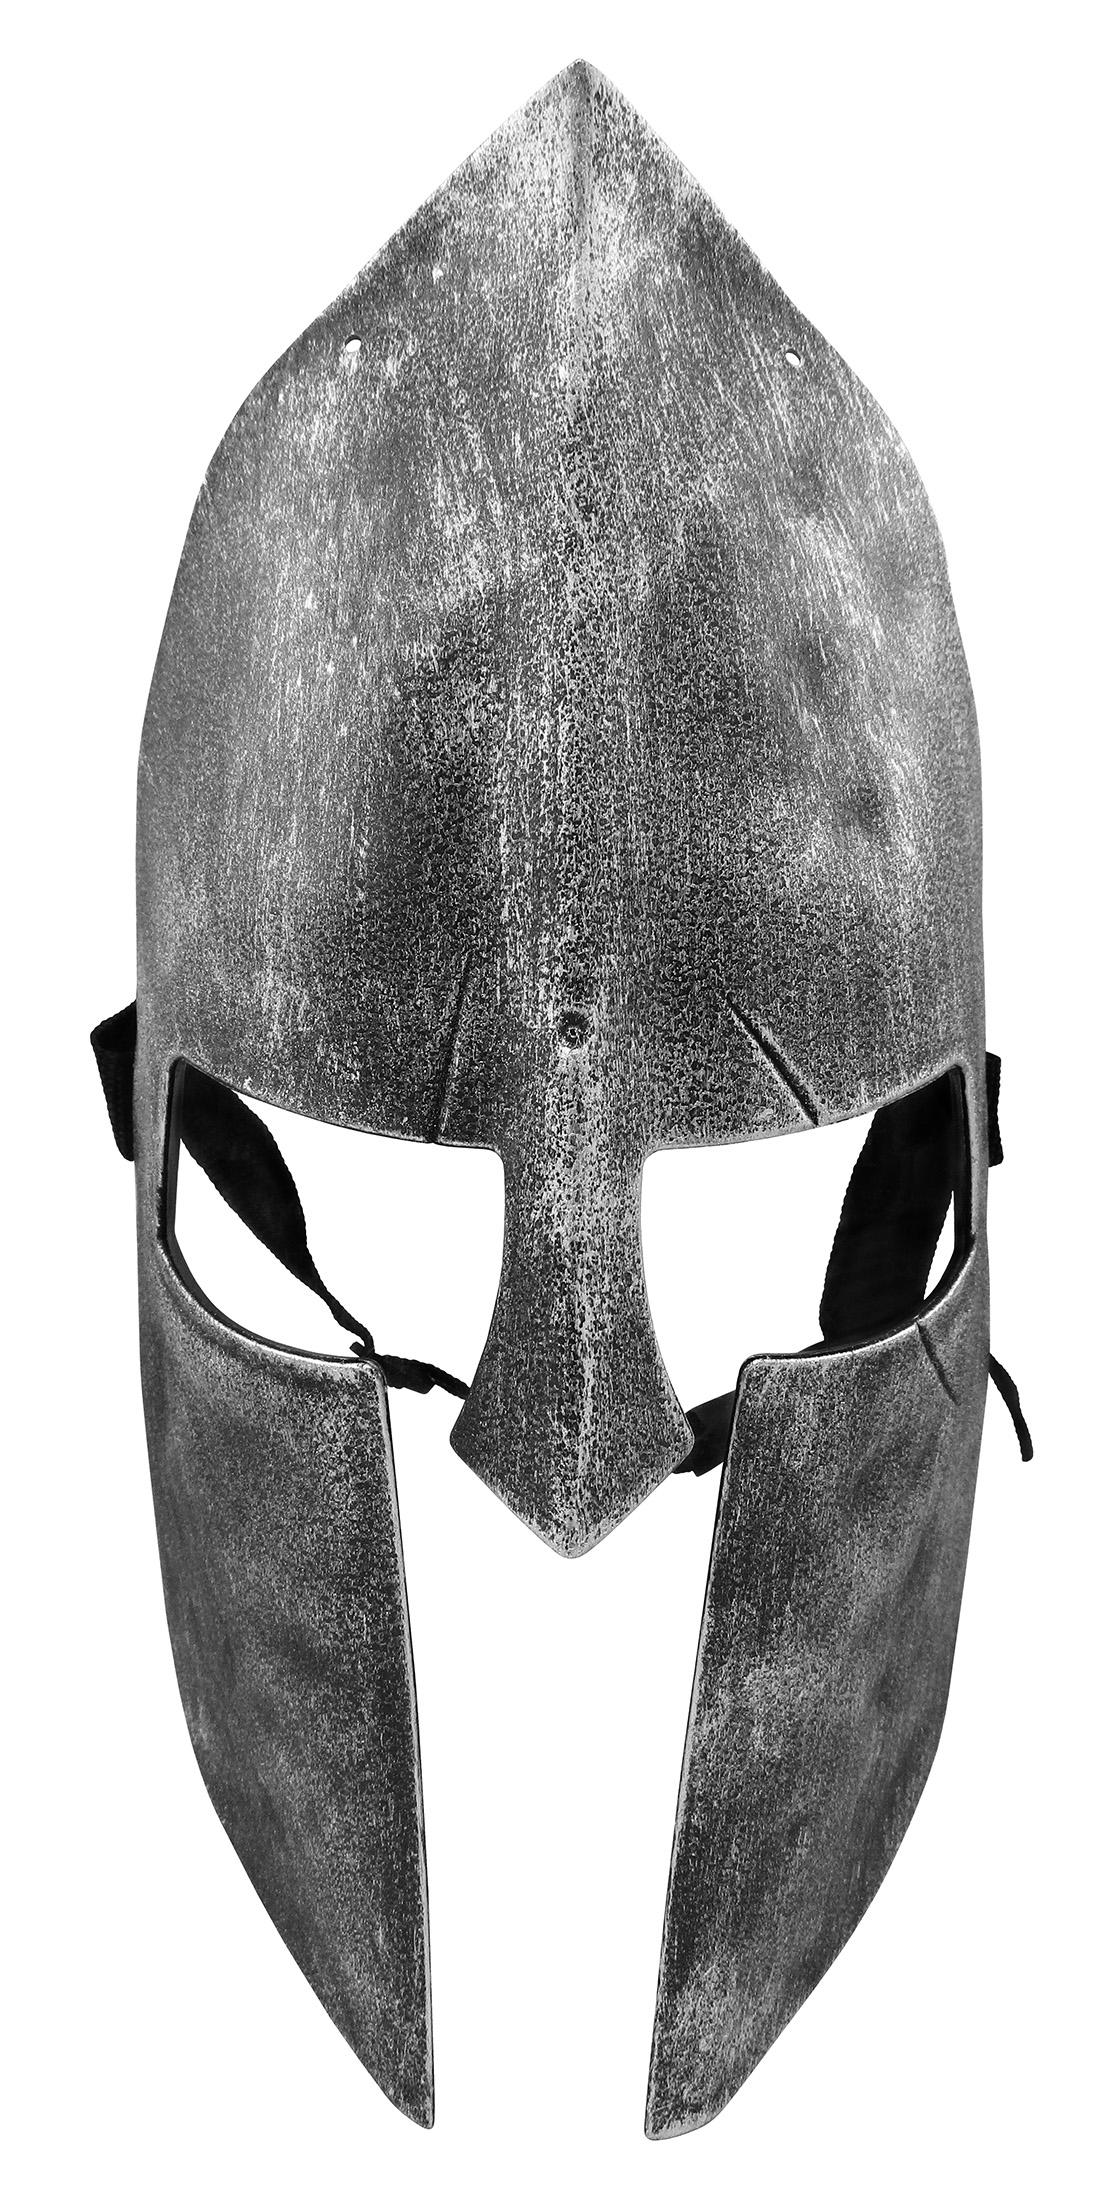 thumbnail 8 - Medieval Iron Knight Spartan Helmet Face Mask Roman Warrior Greek Costume